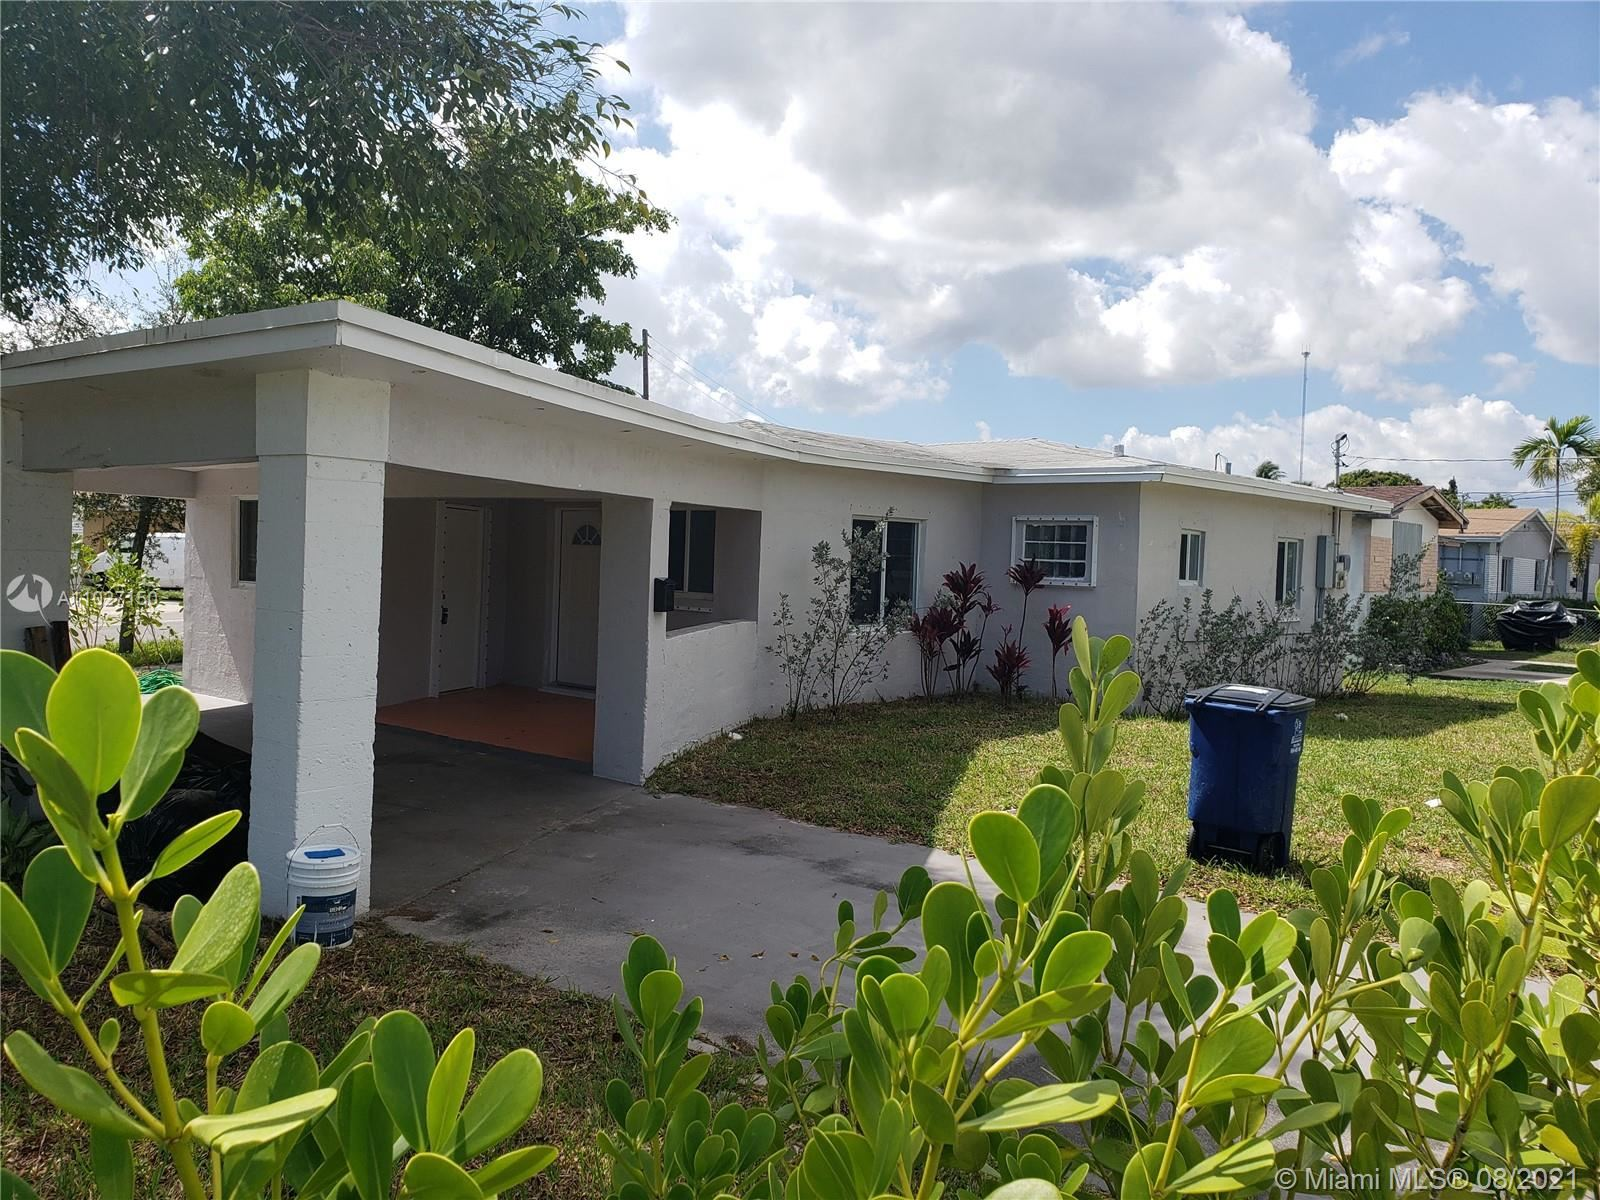 621 NW 6th Ct, Hallandale Beach, FL 33009 - #: A11027150